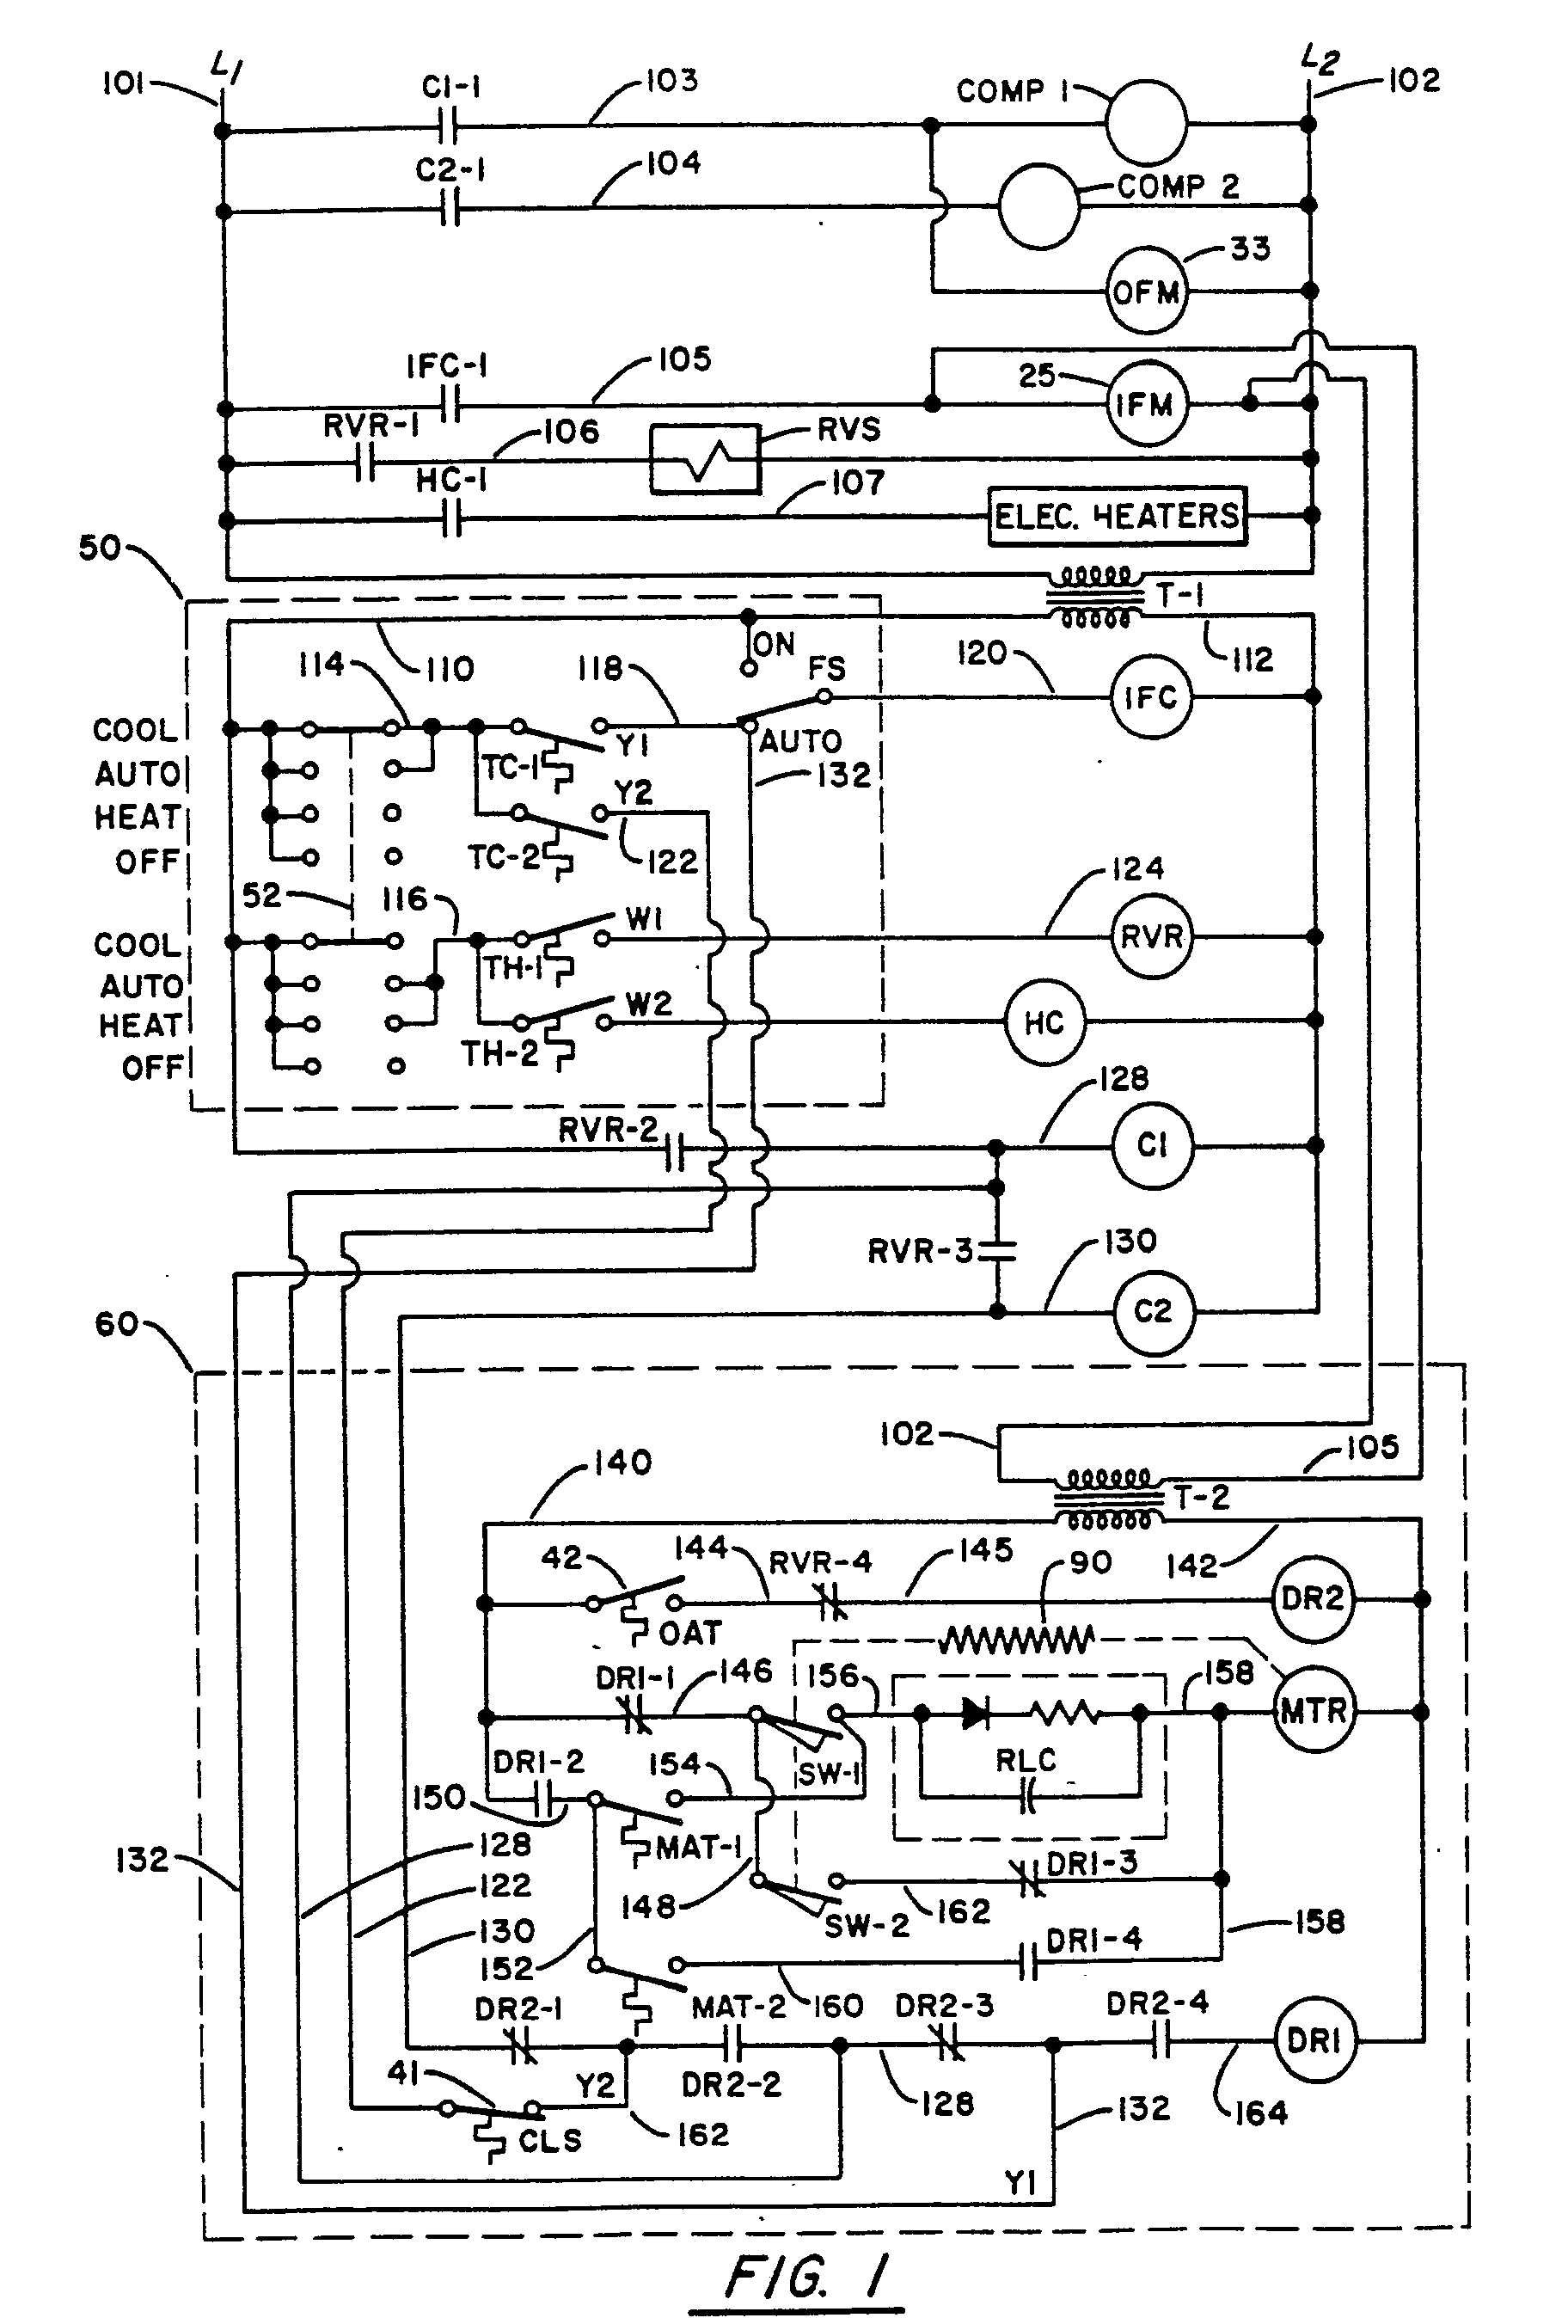 e ton 90 wiring diagram diagram base website wiring diagram -  alternatordiagrams.pasqualehamel.it  pasqualehamel